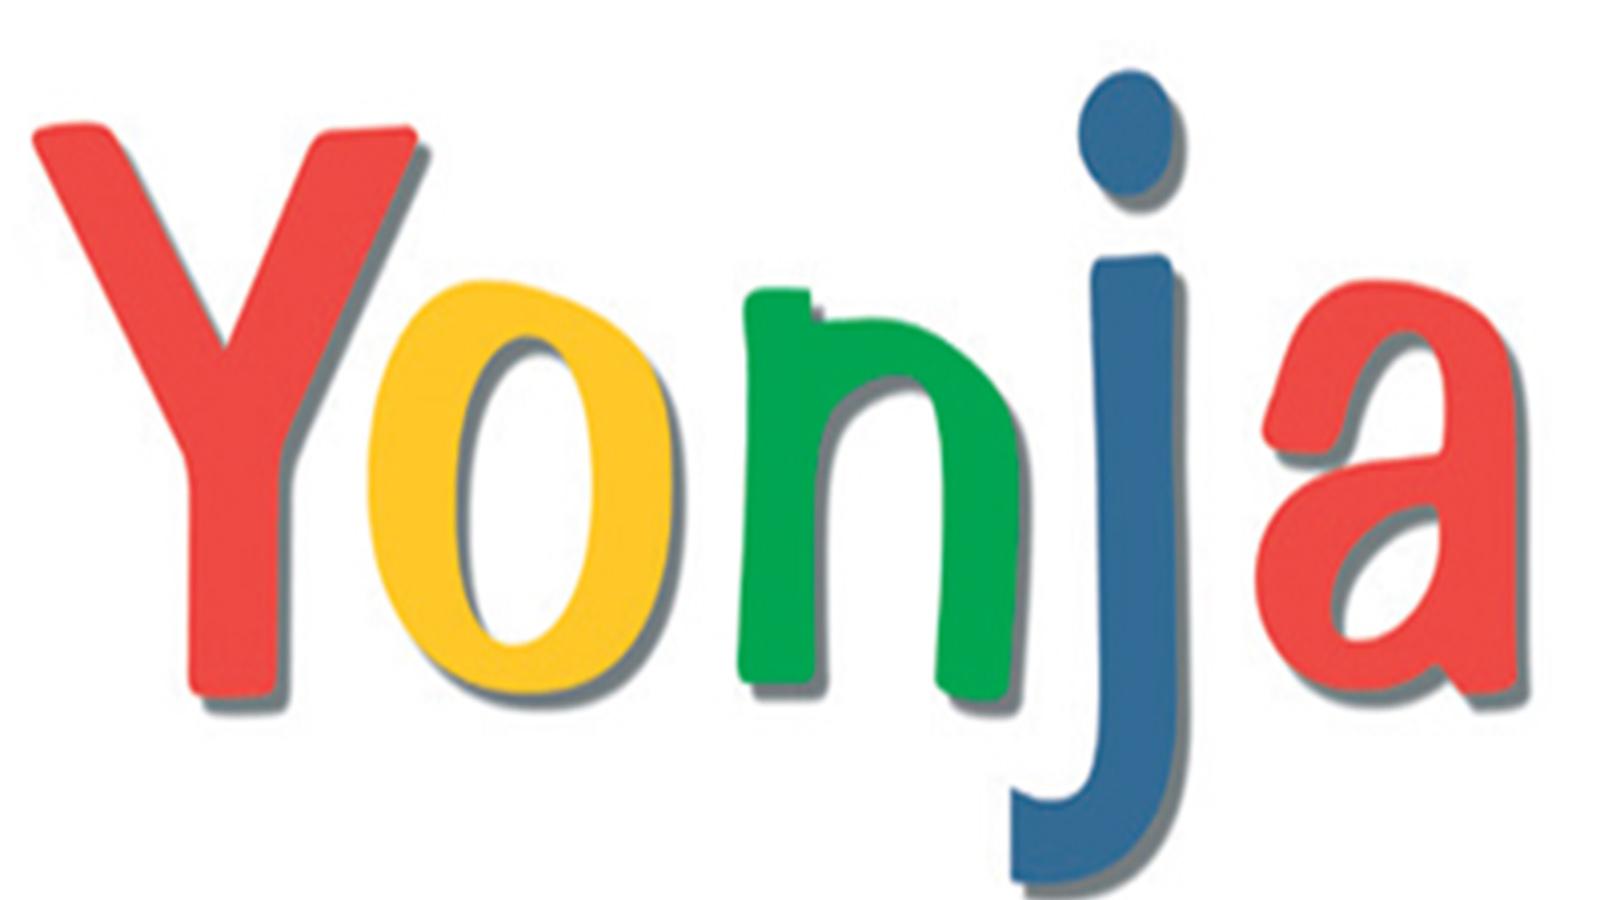 Yonja